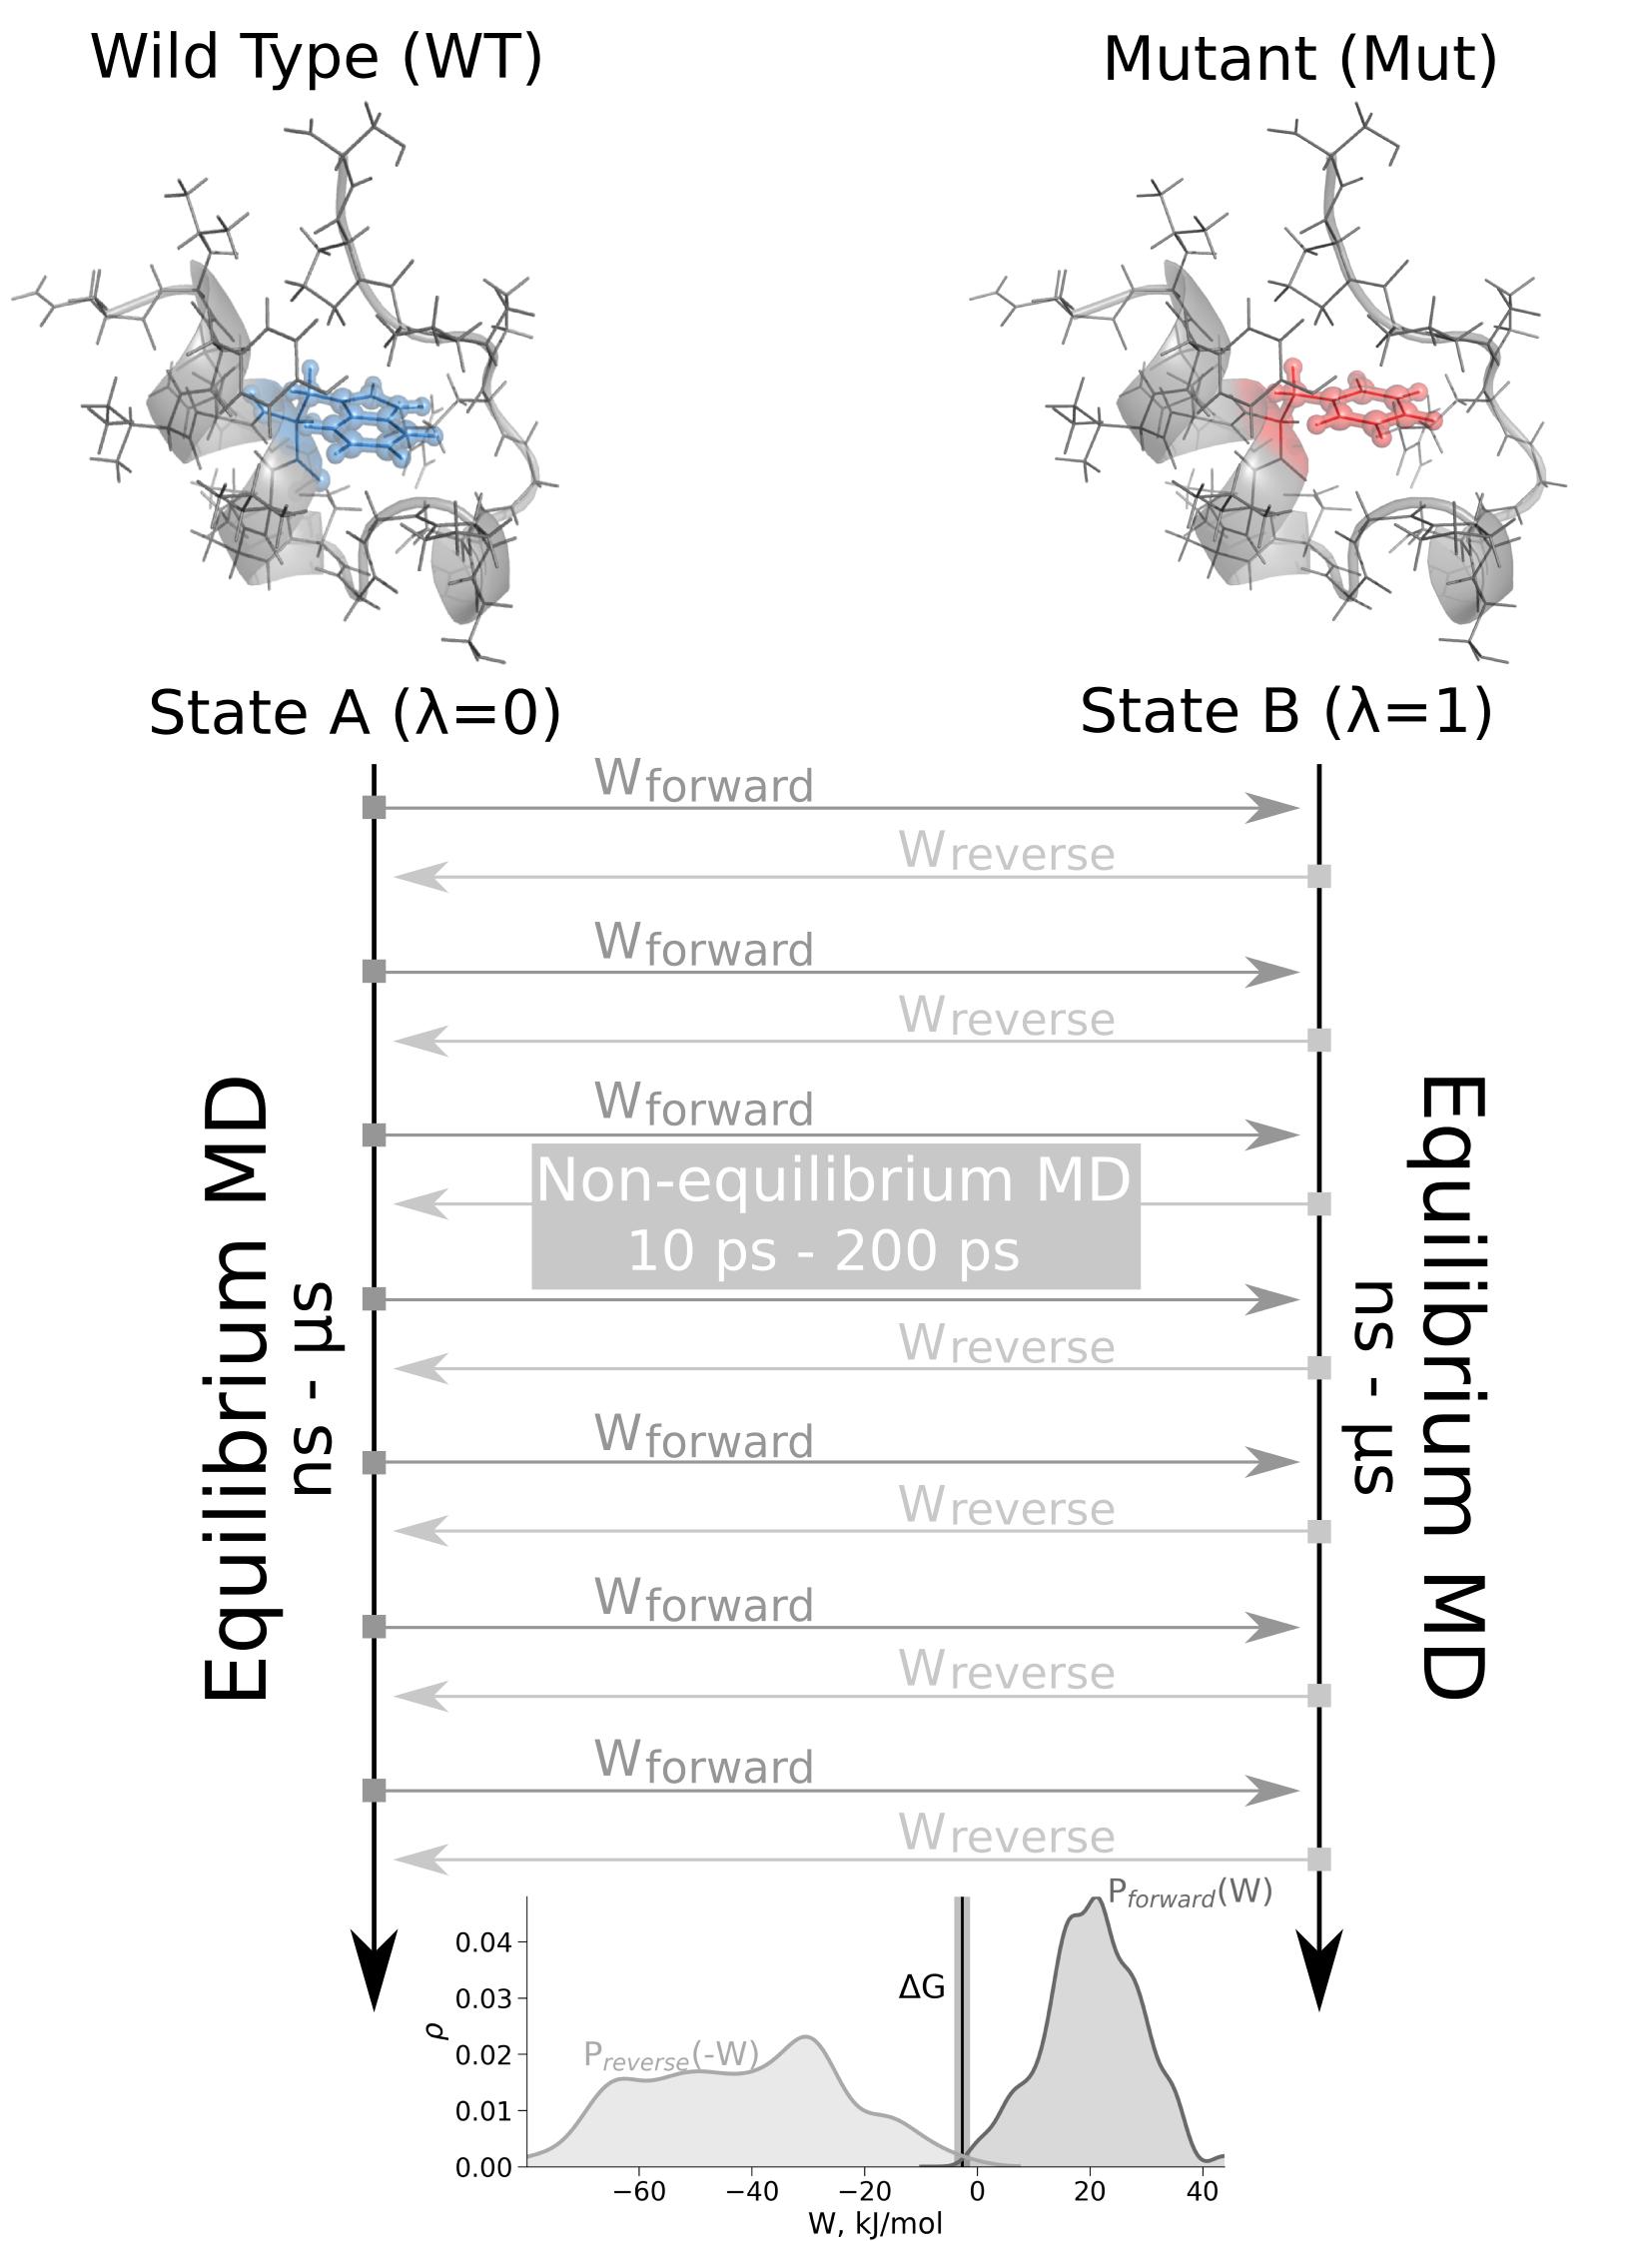 Mutation free energy calculations